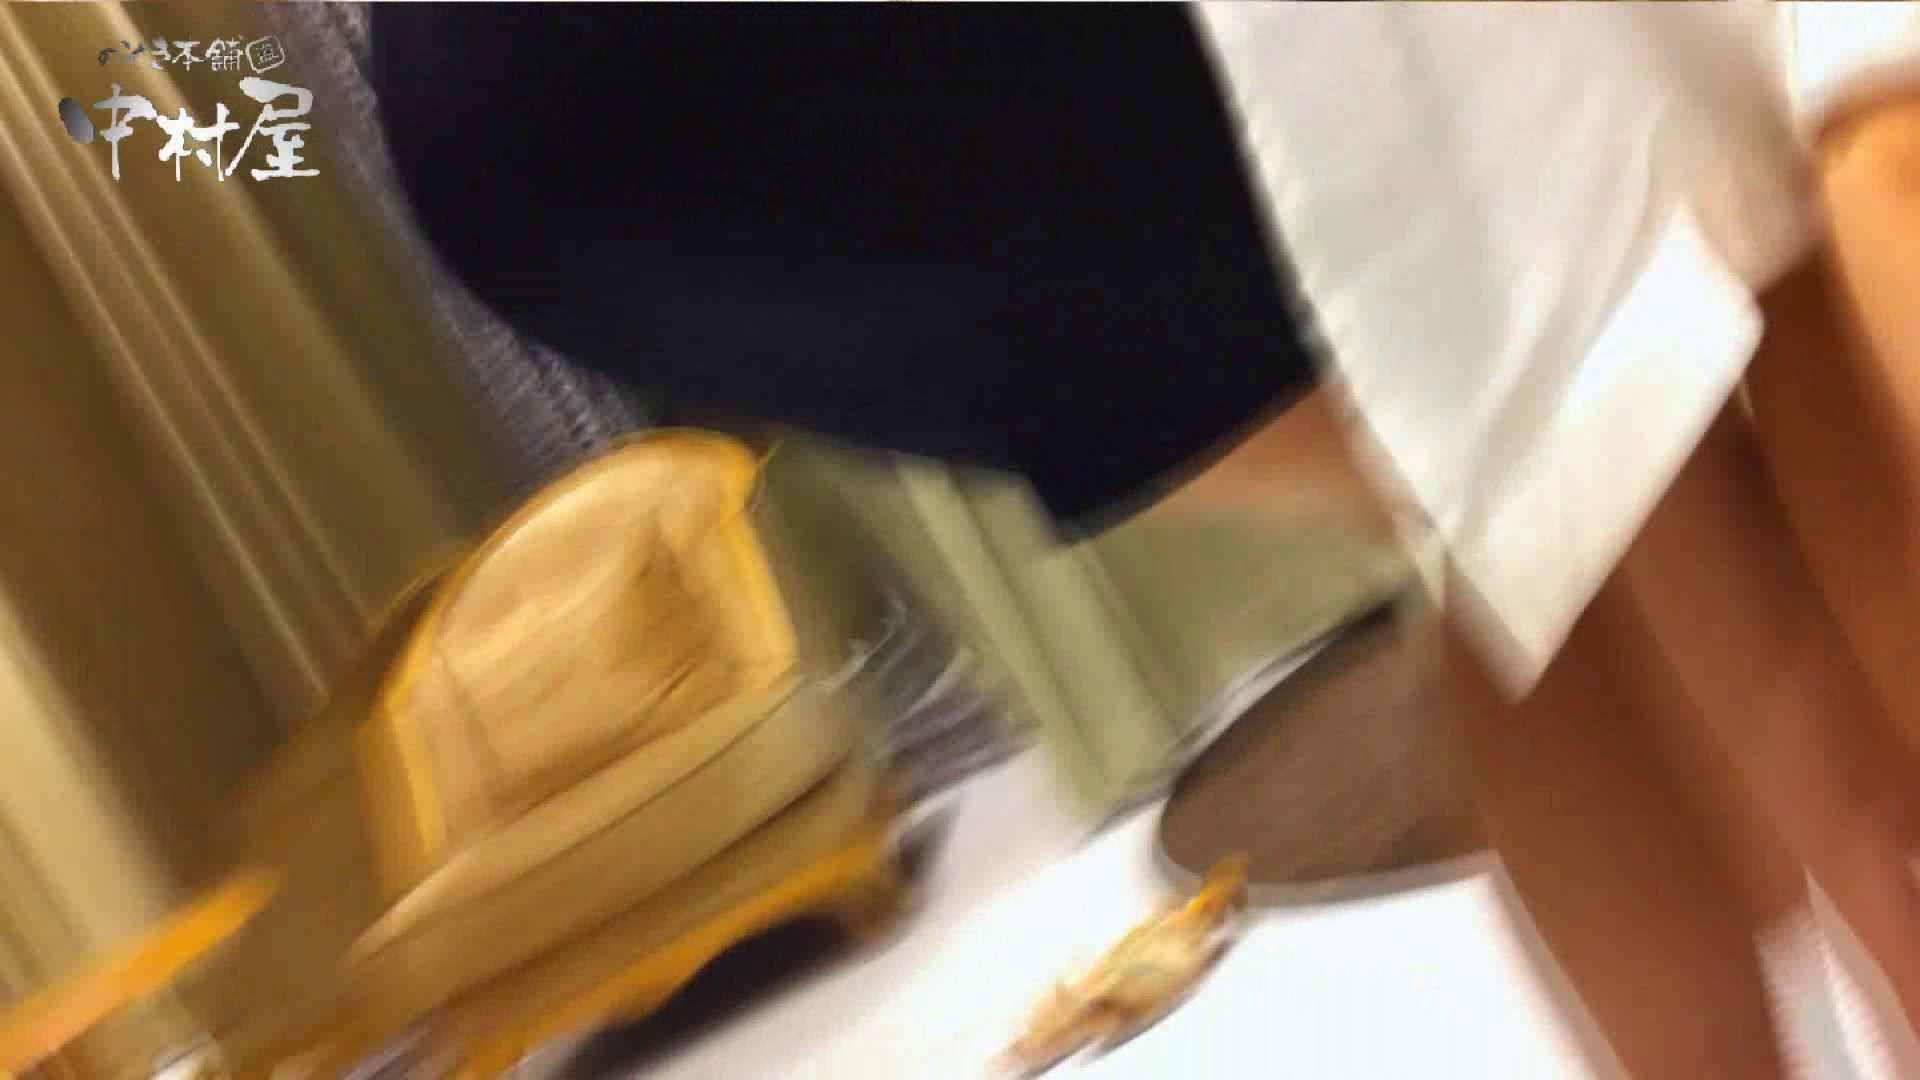 vol.43 可愛いカリスマ店員限定‼胸チラ&パンチラ 美脚おねーさんの胸元ゲット! 接写 | 胸チラ  76PIX 69